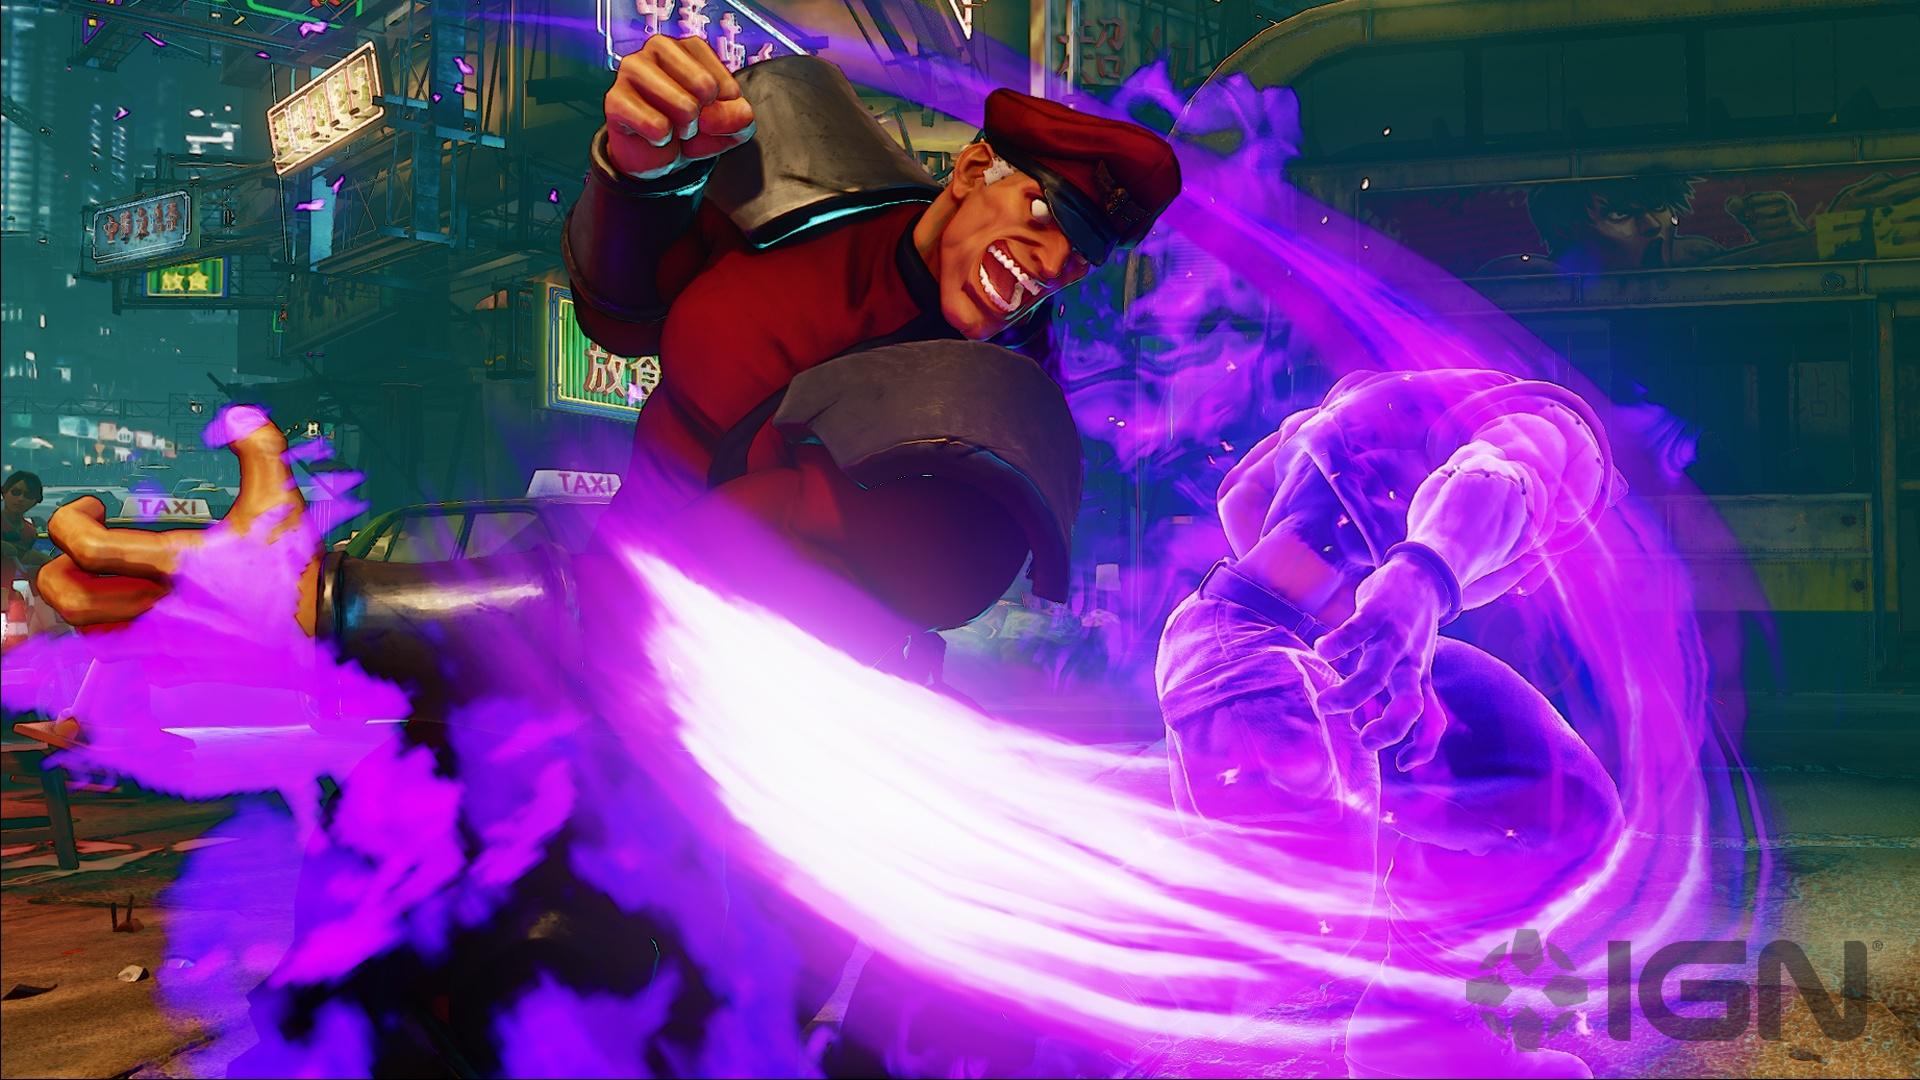 [GAMES] Street Fighter V - Personagem inédito! - Página 2 03-swipe-r7r2_6qbf.1920